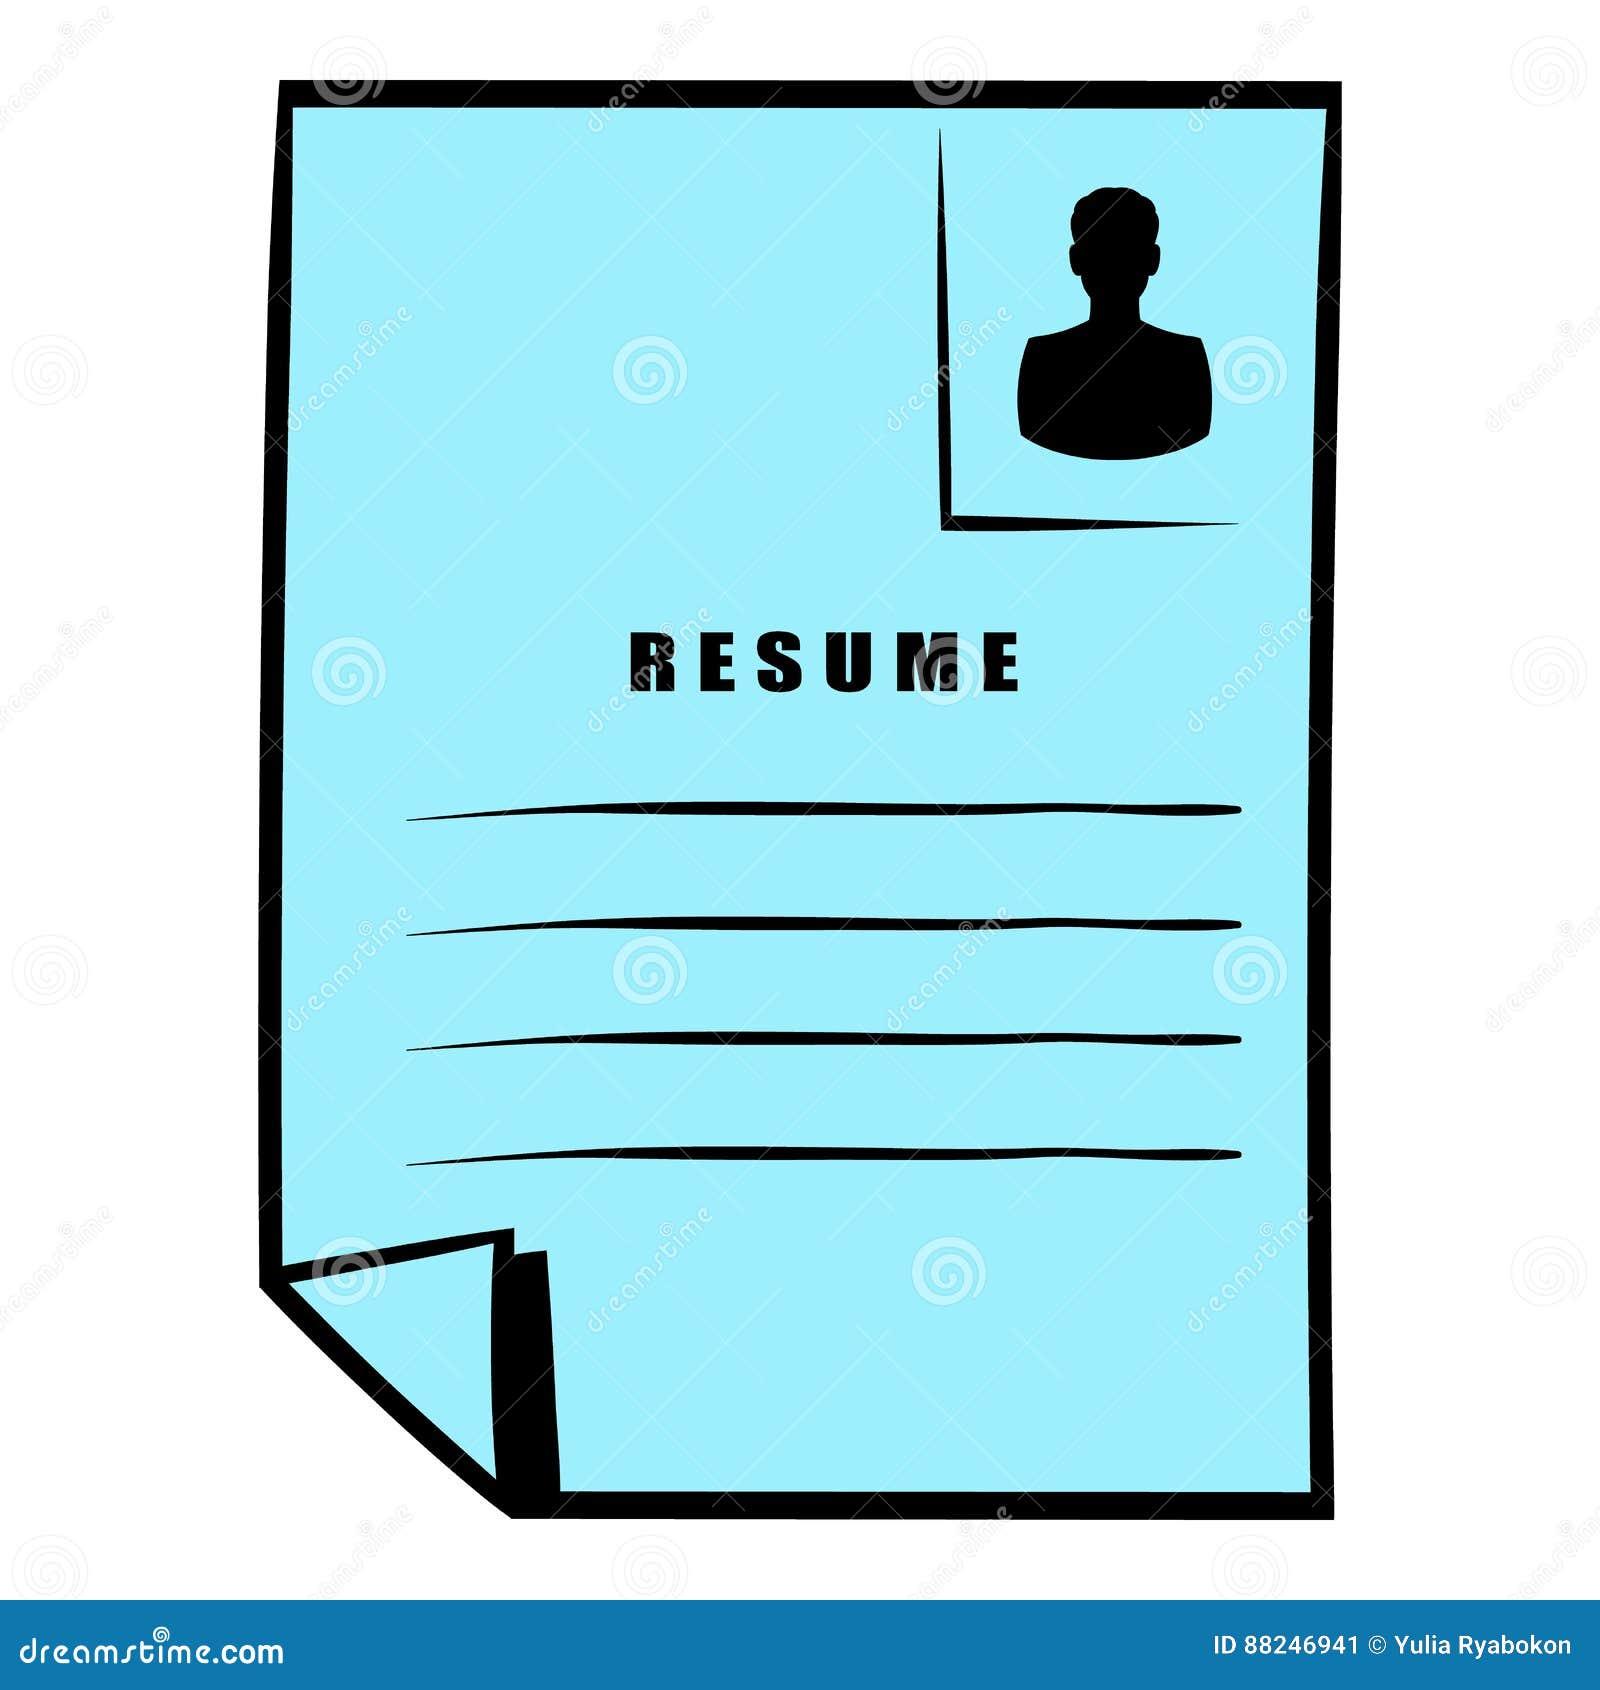 download resume icon icon cartoon stock vector illustration of icon 88246941 - Resume Icon